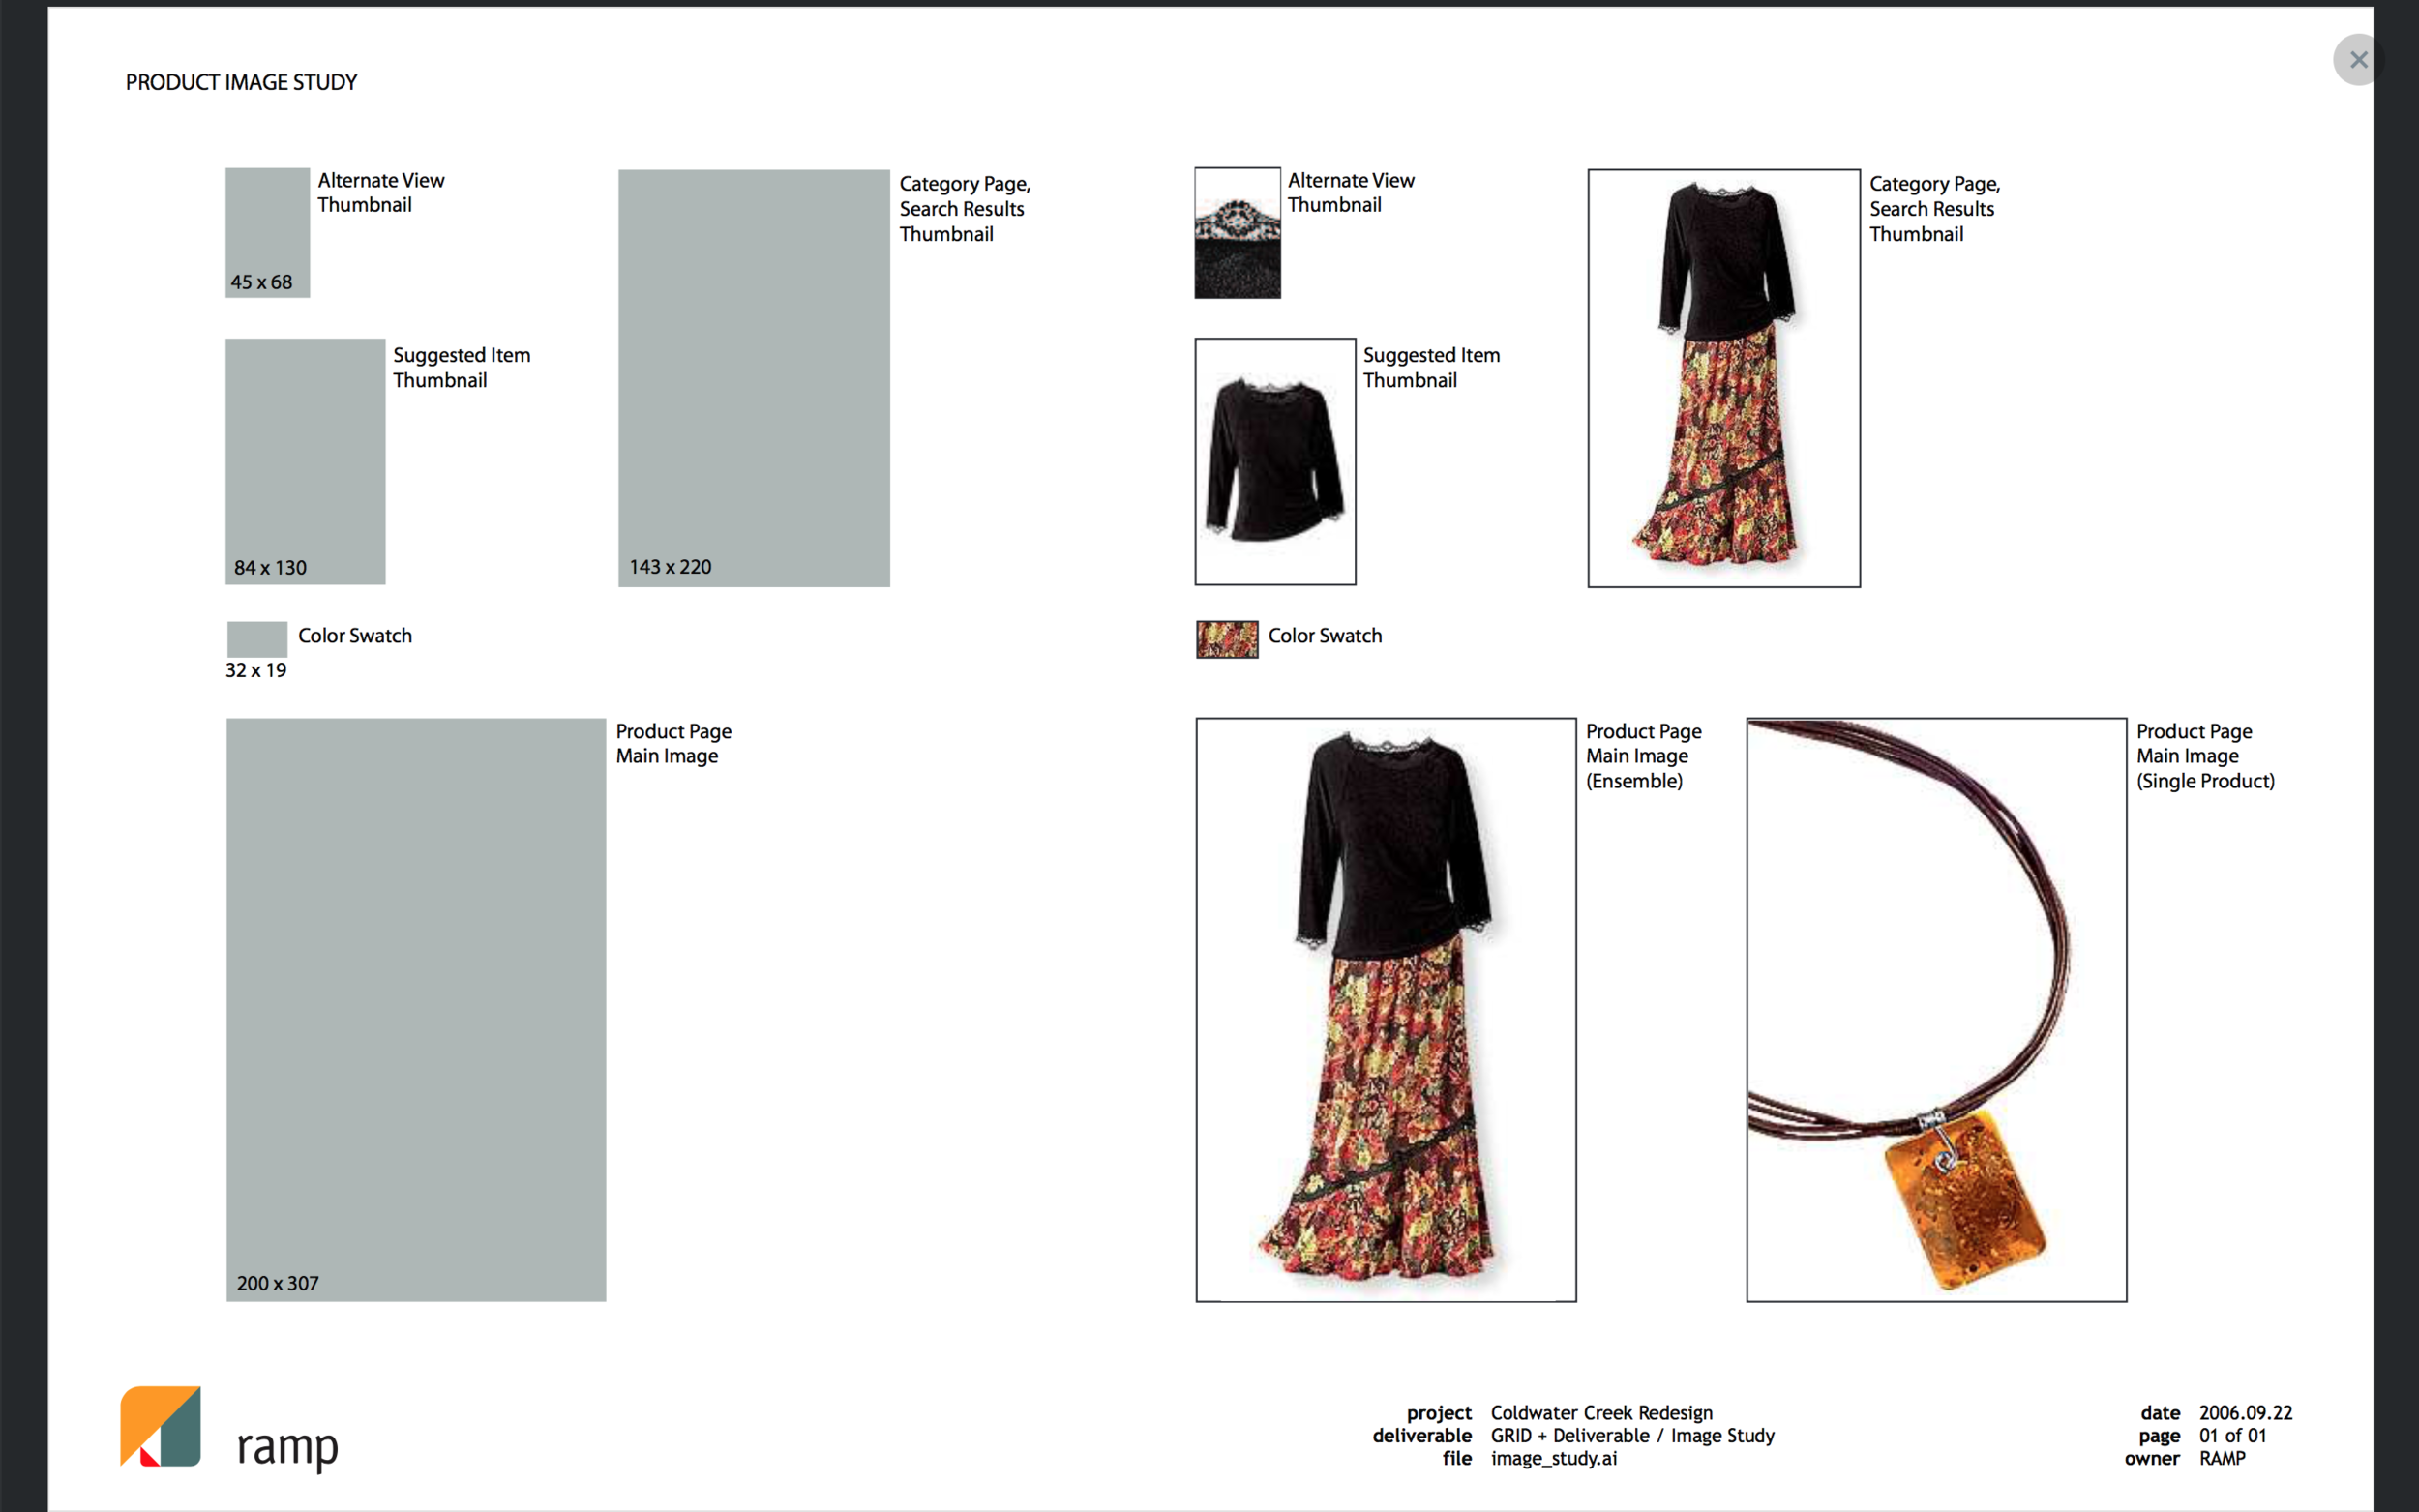 Product Image Study